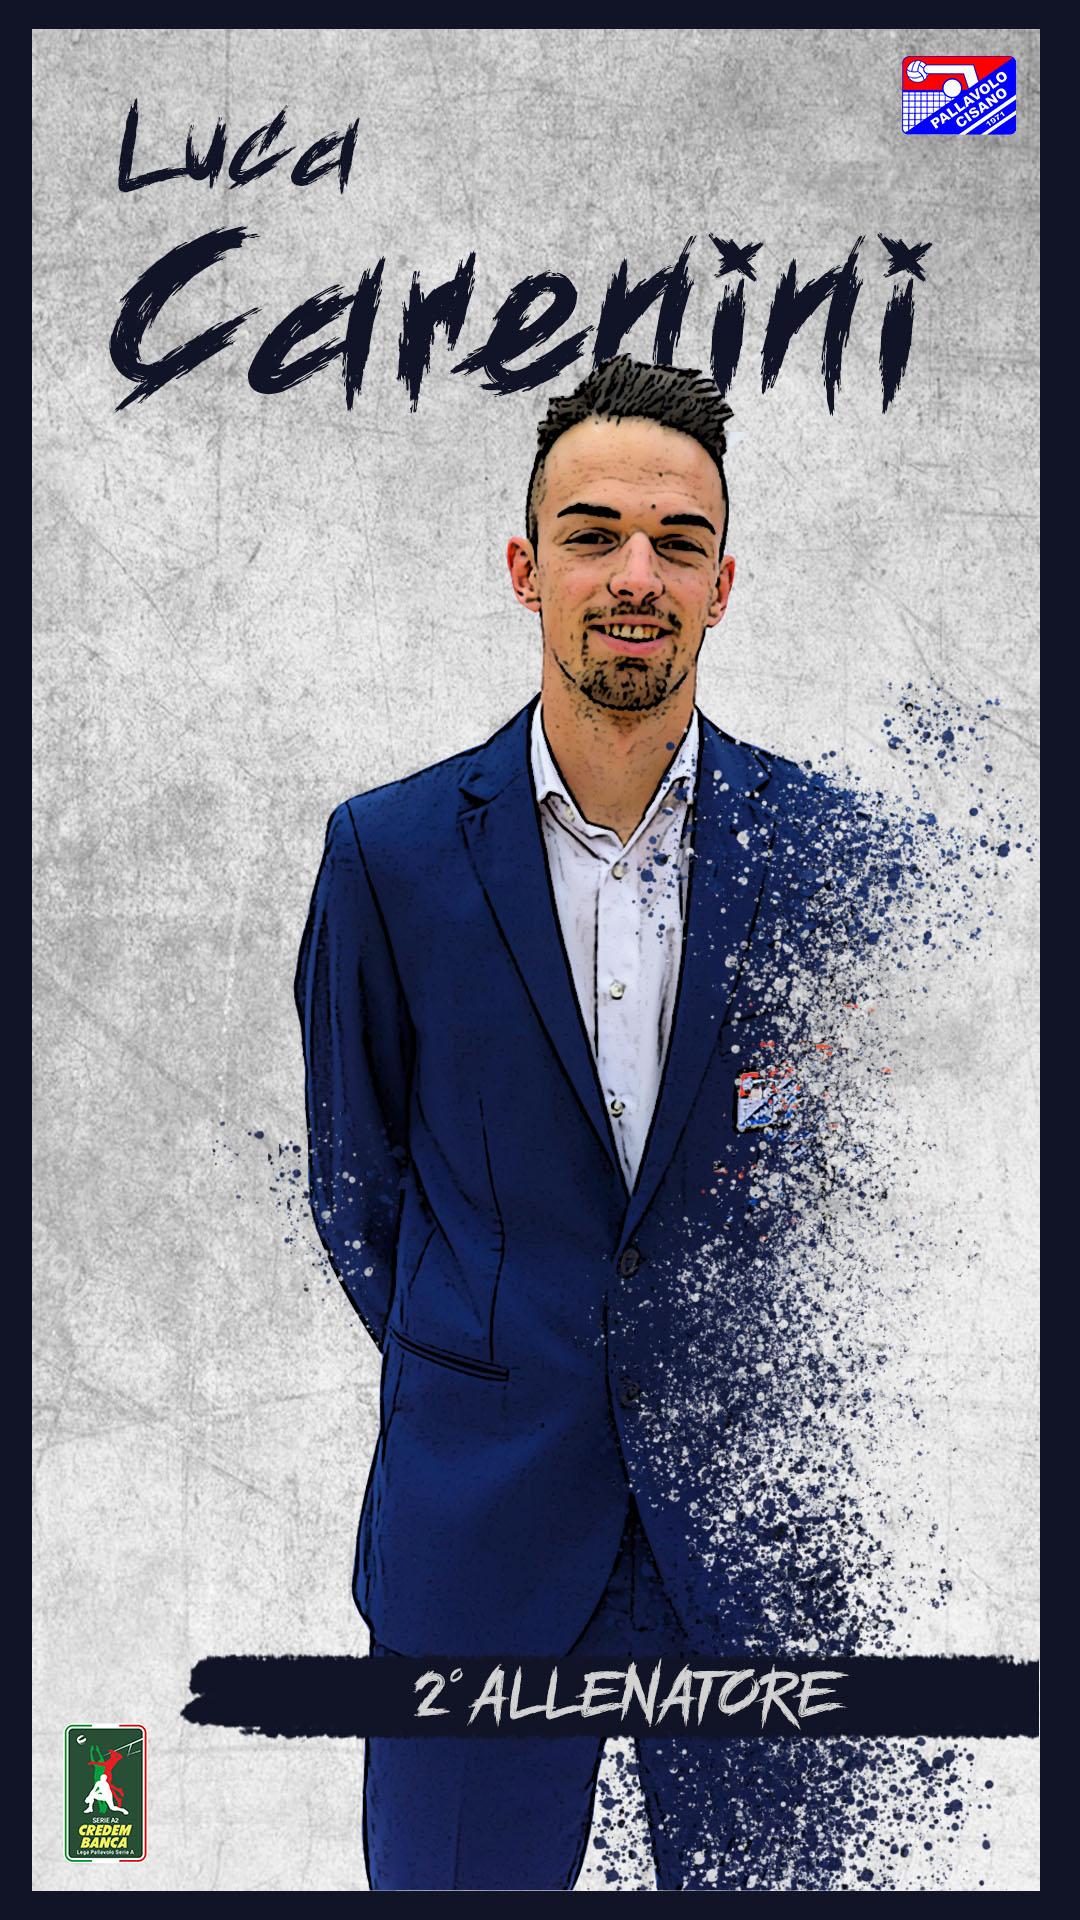 Wallpaper giocatoriCarenini